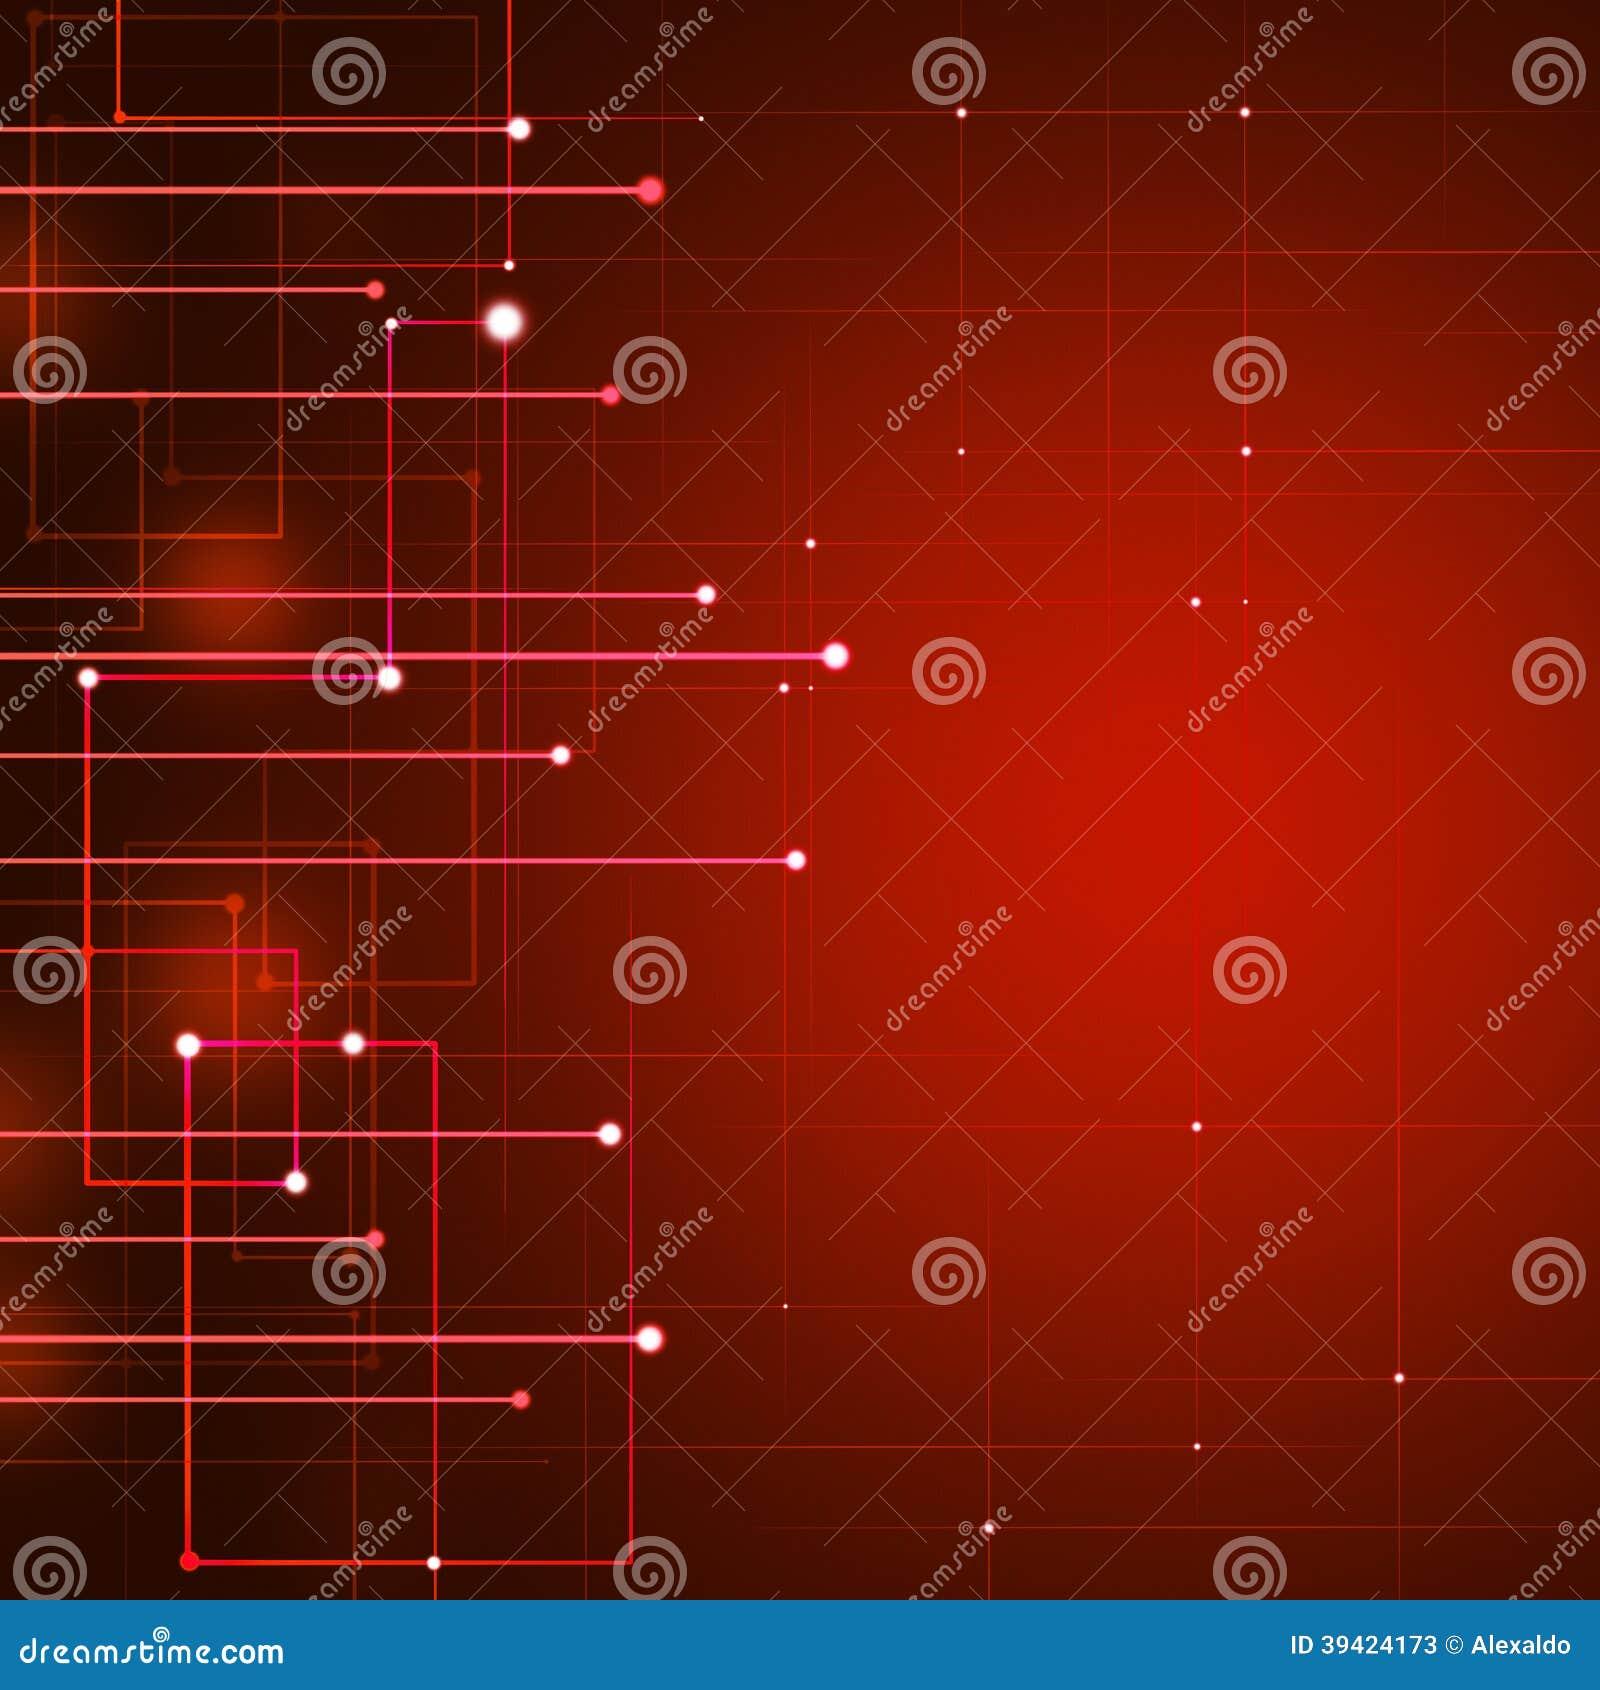 Red Technology Background Stock Illustration - Image: 39424173